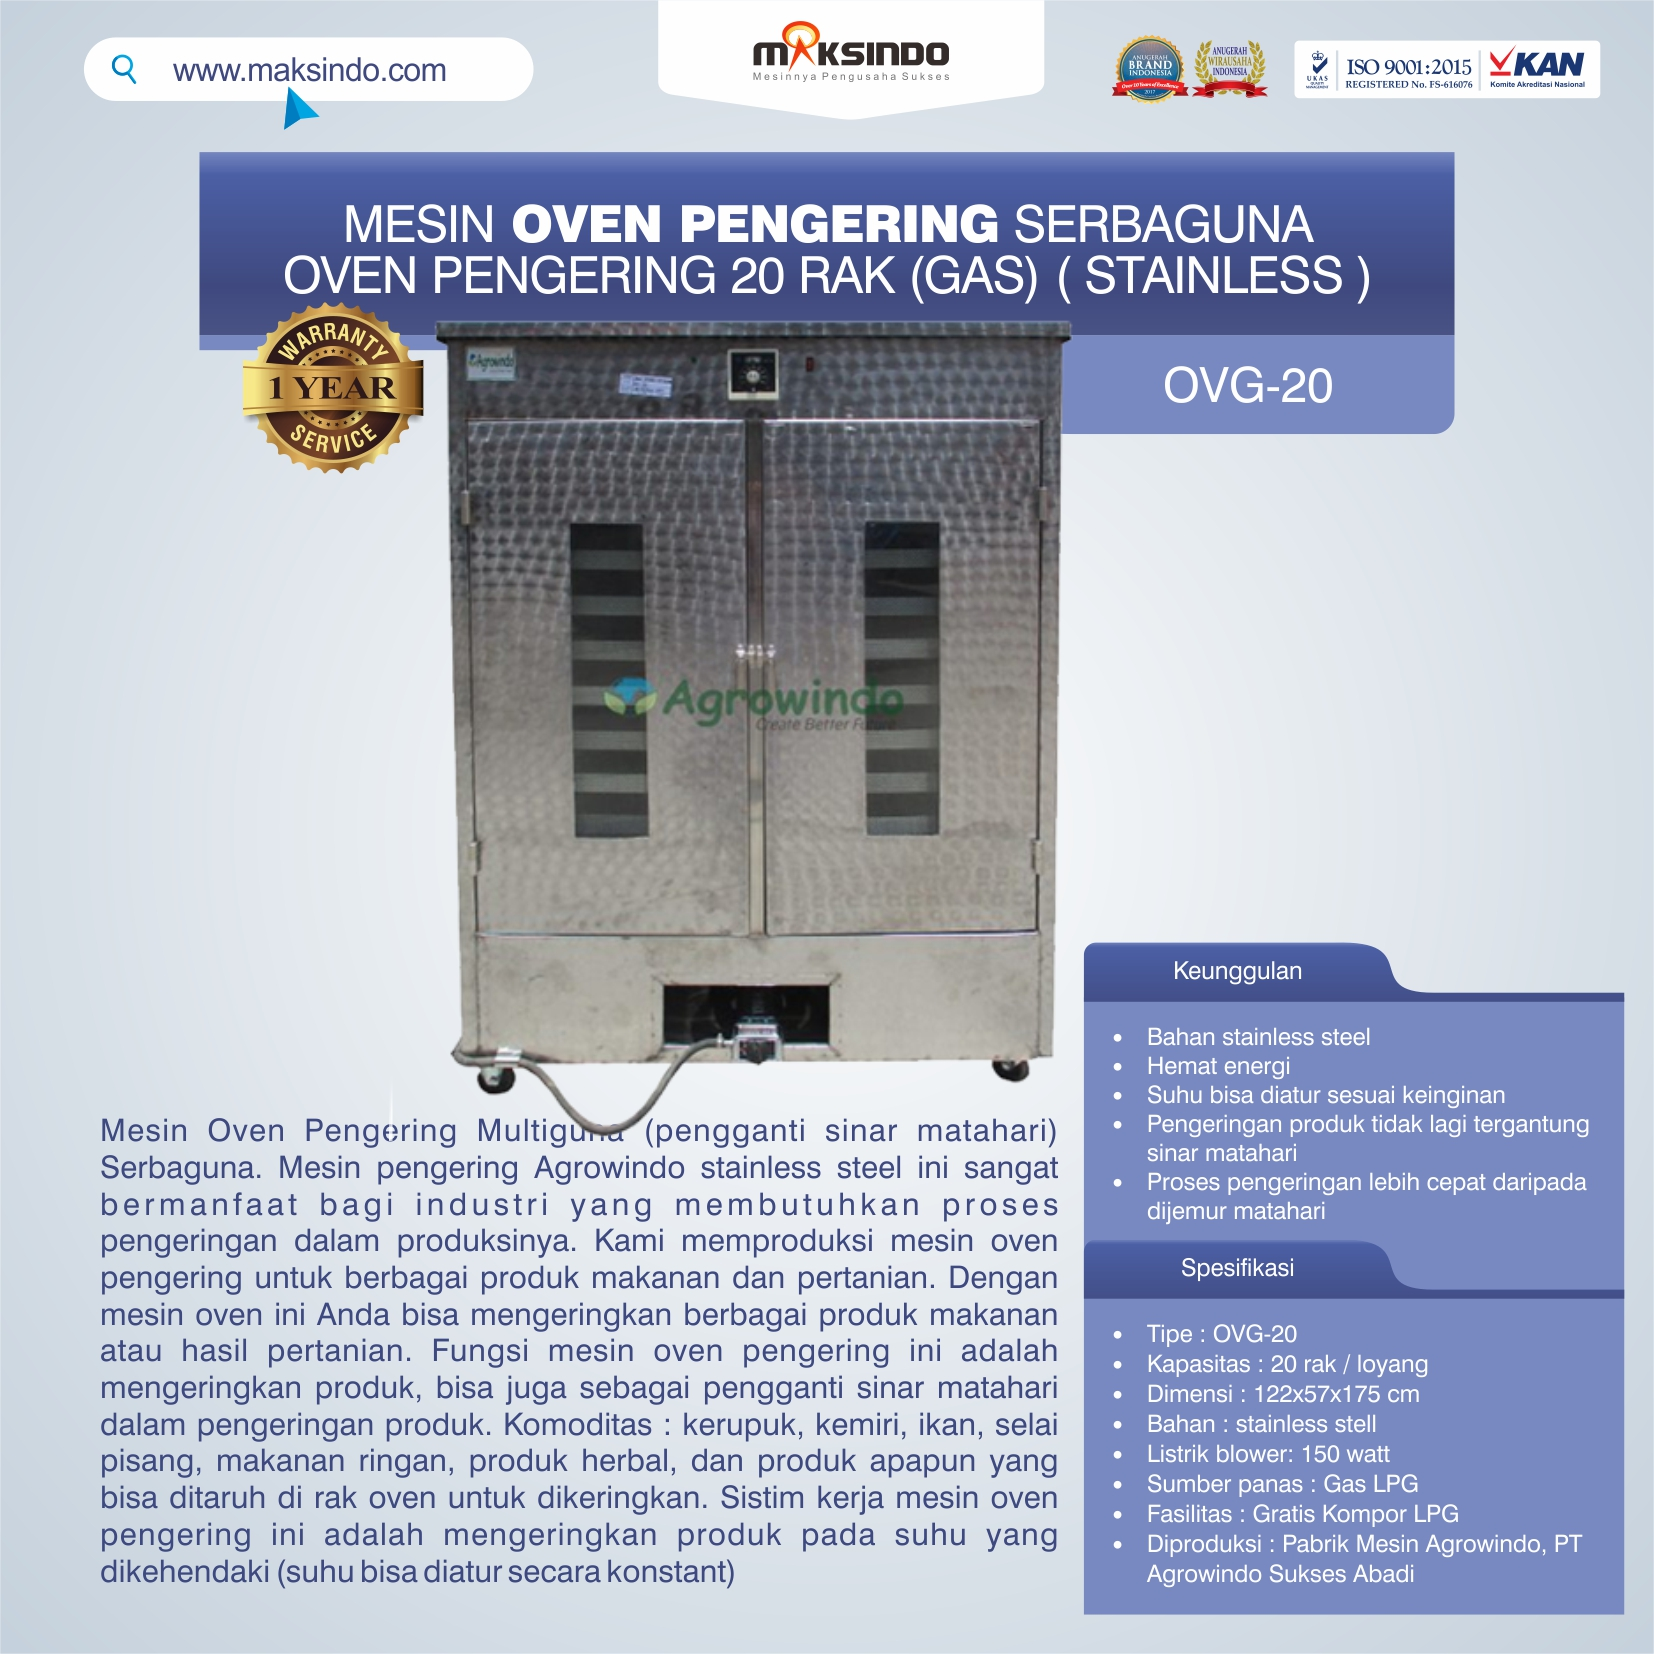 OVG-20 Mesin Oven Pengering Serbaguna 20 Rak (Gas) (Stainless )